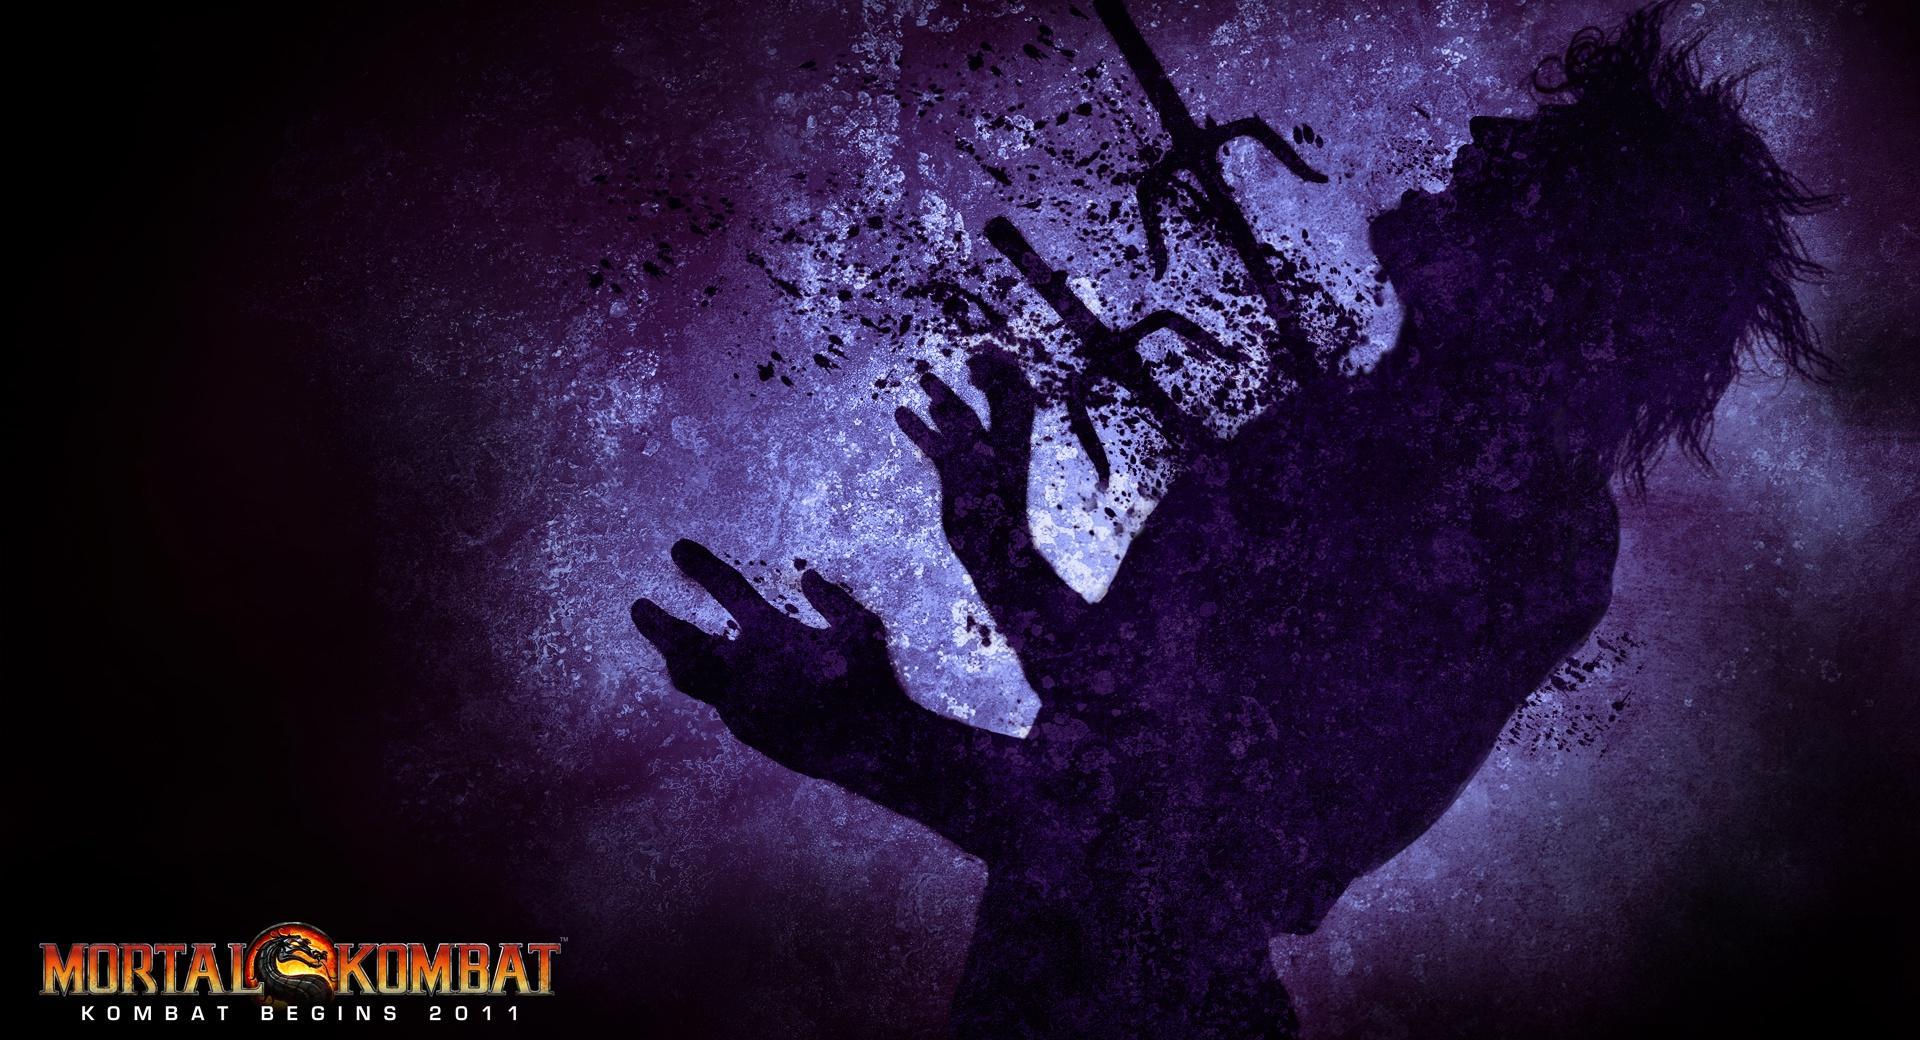 Mortal Kombat 9 Mileena Wallpaper Hd Download